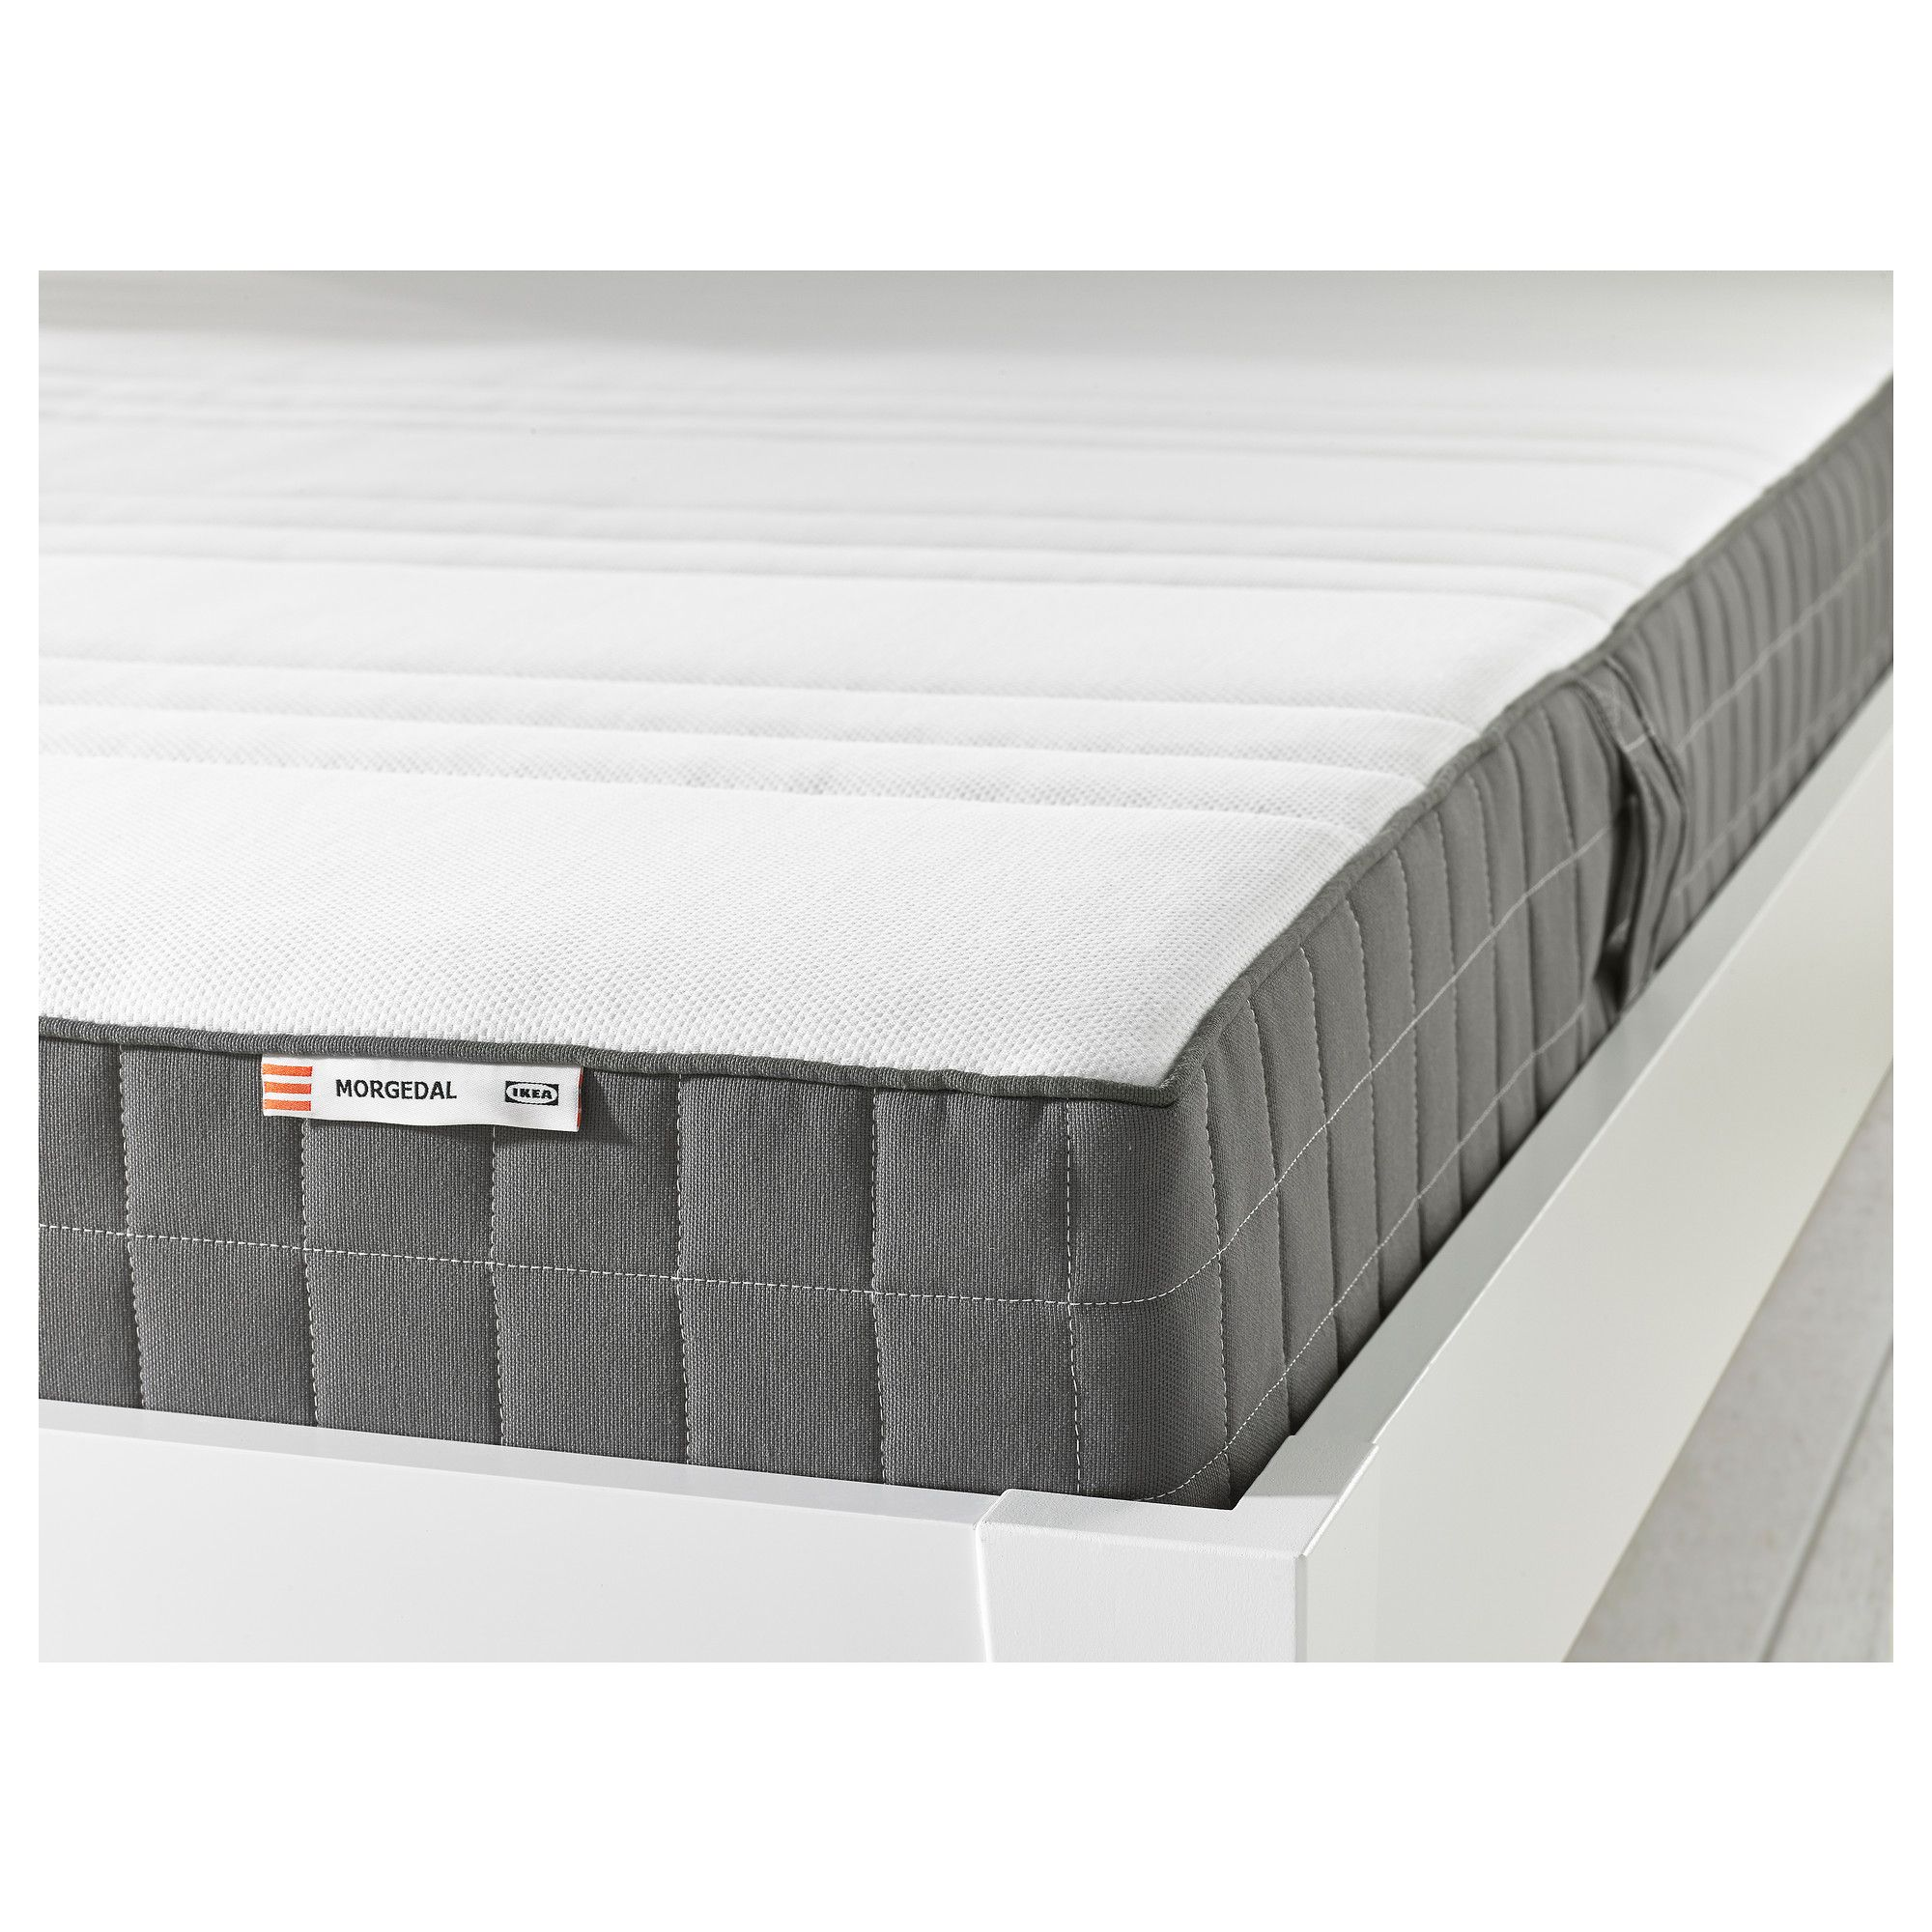 Foam mattress firm, dark grey Standard Double